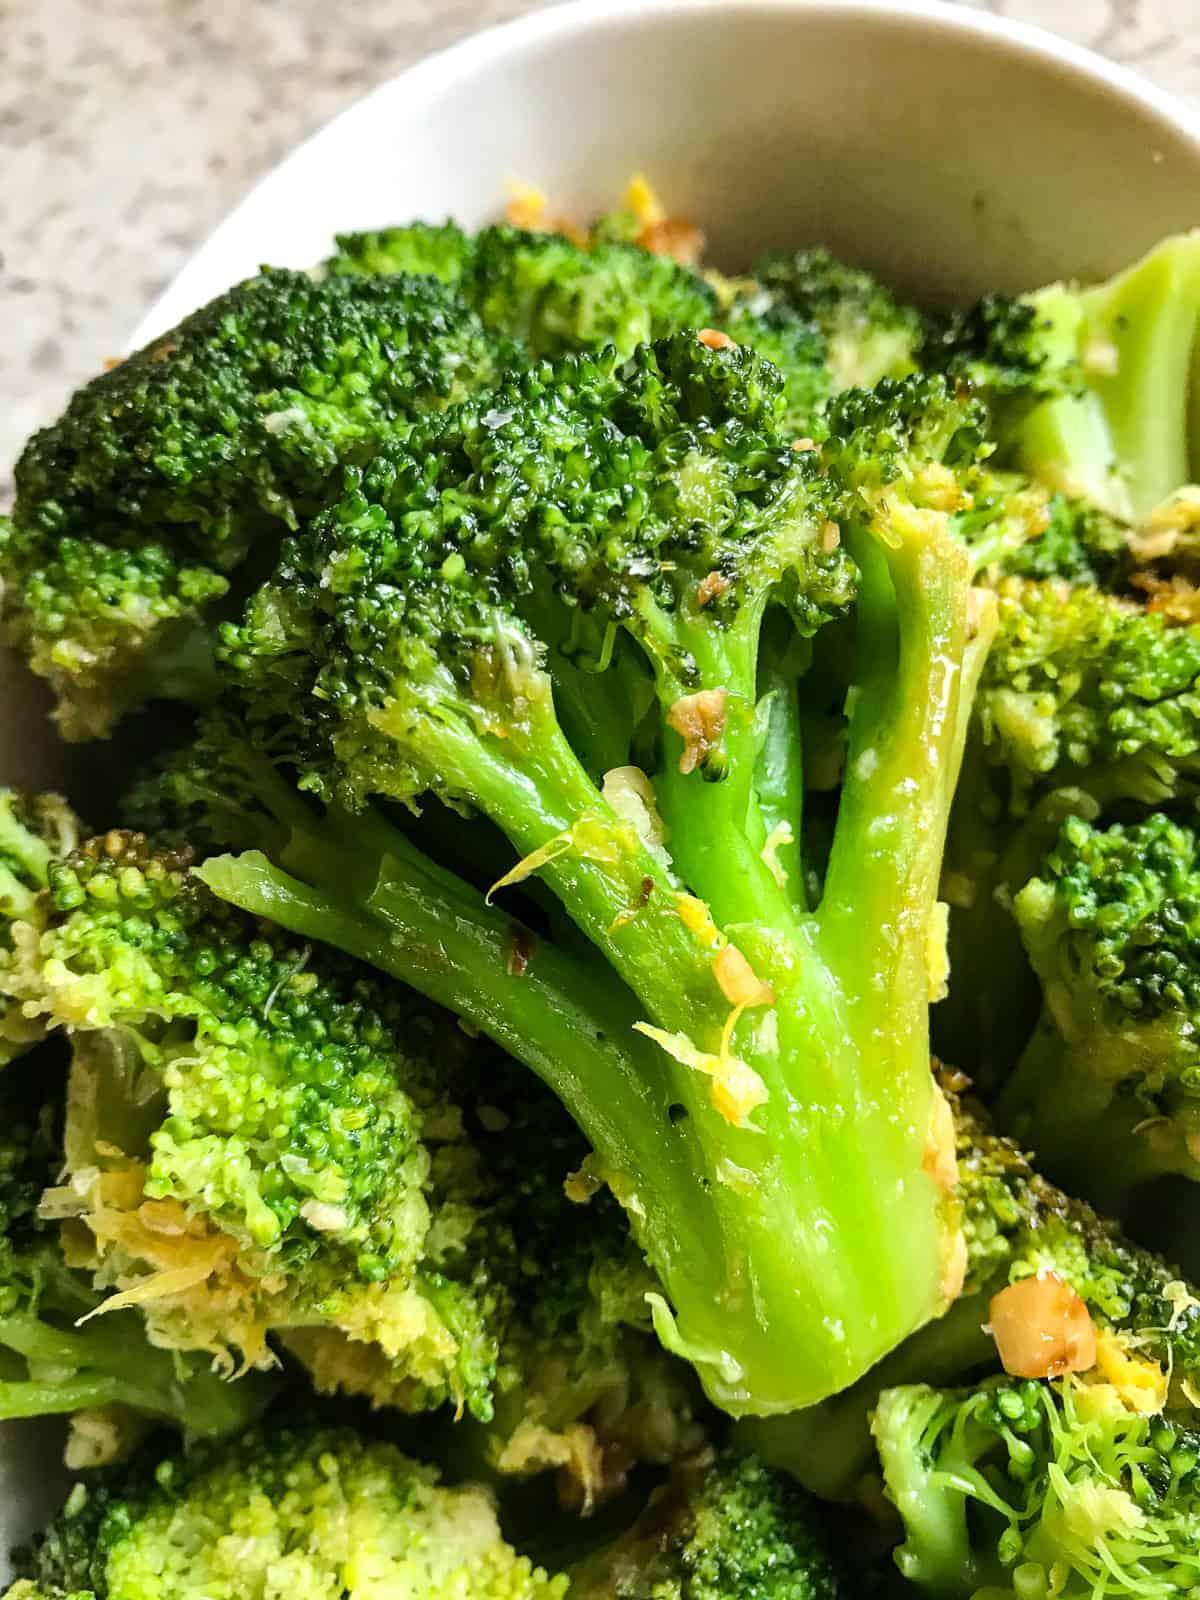 Cooked frozen broccoli floret.